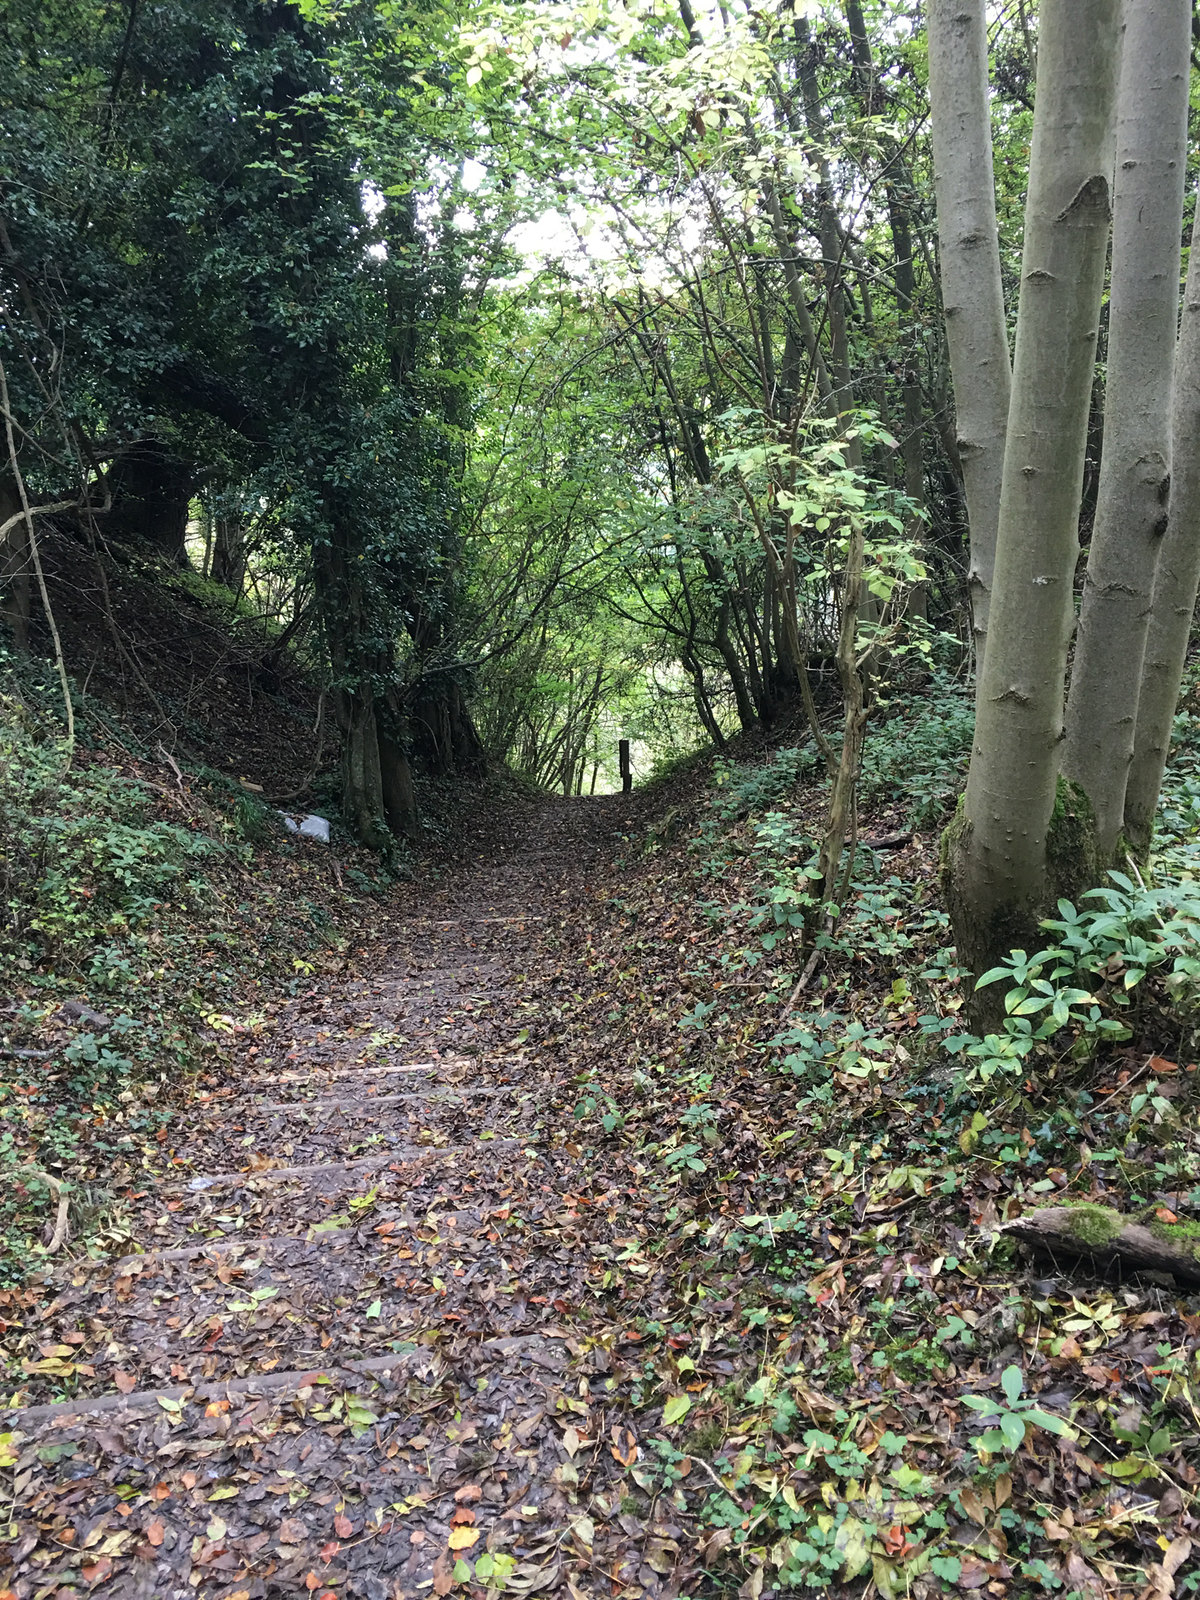 2017-10-08 09.46.57 Woldingham Circular